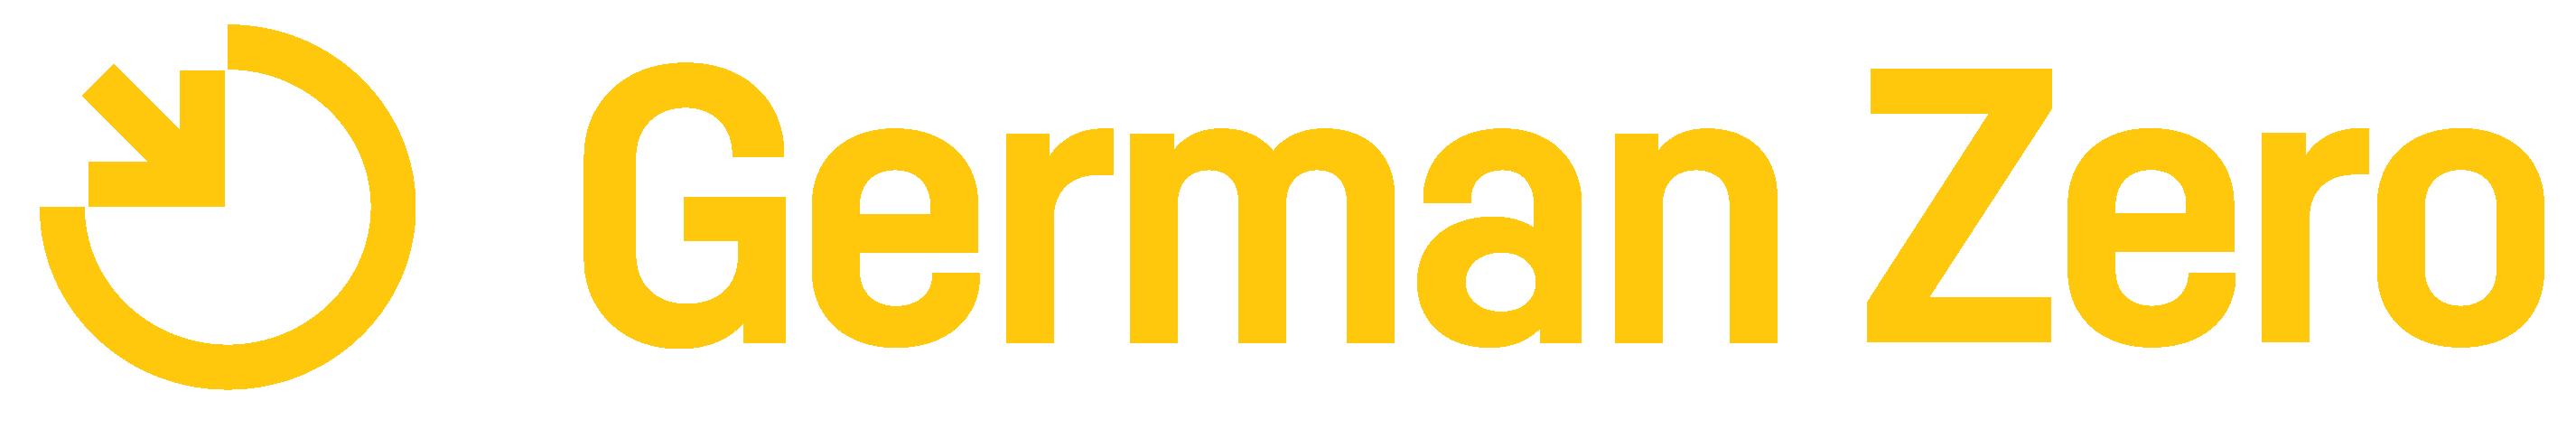 germanzero